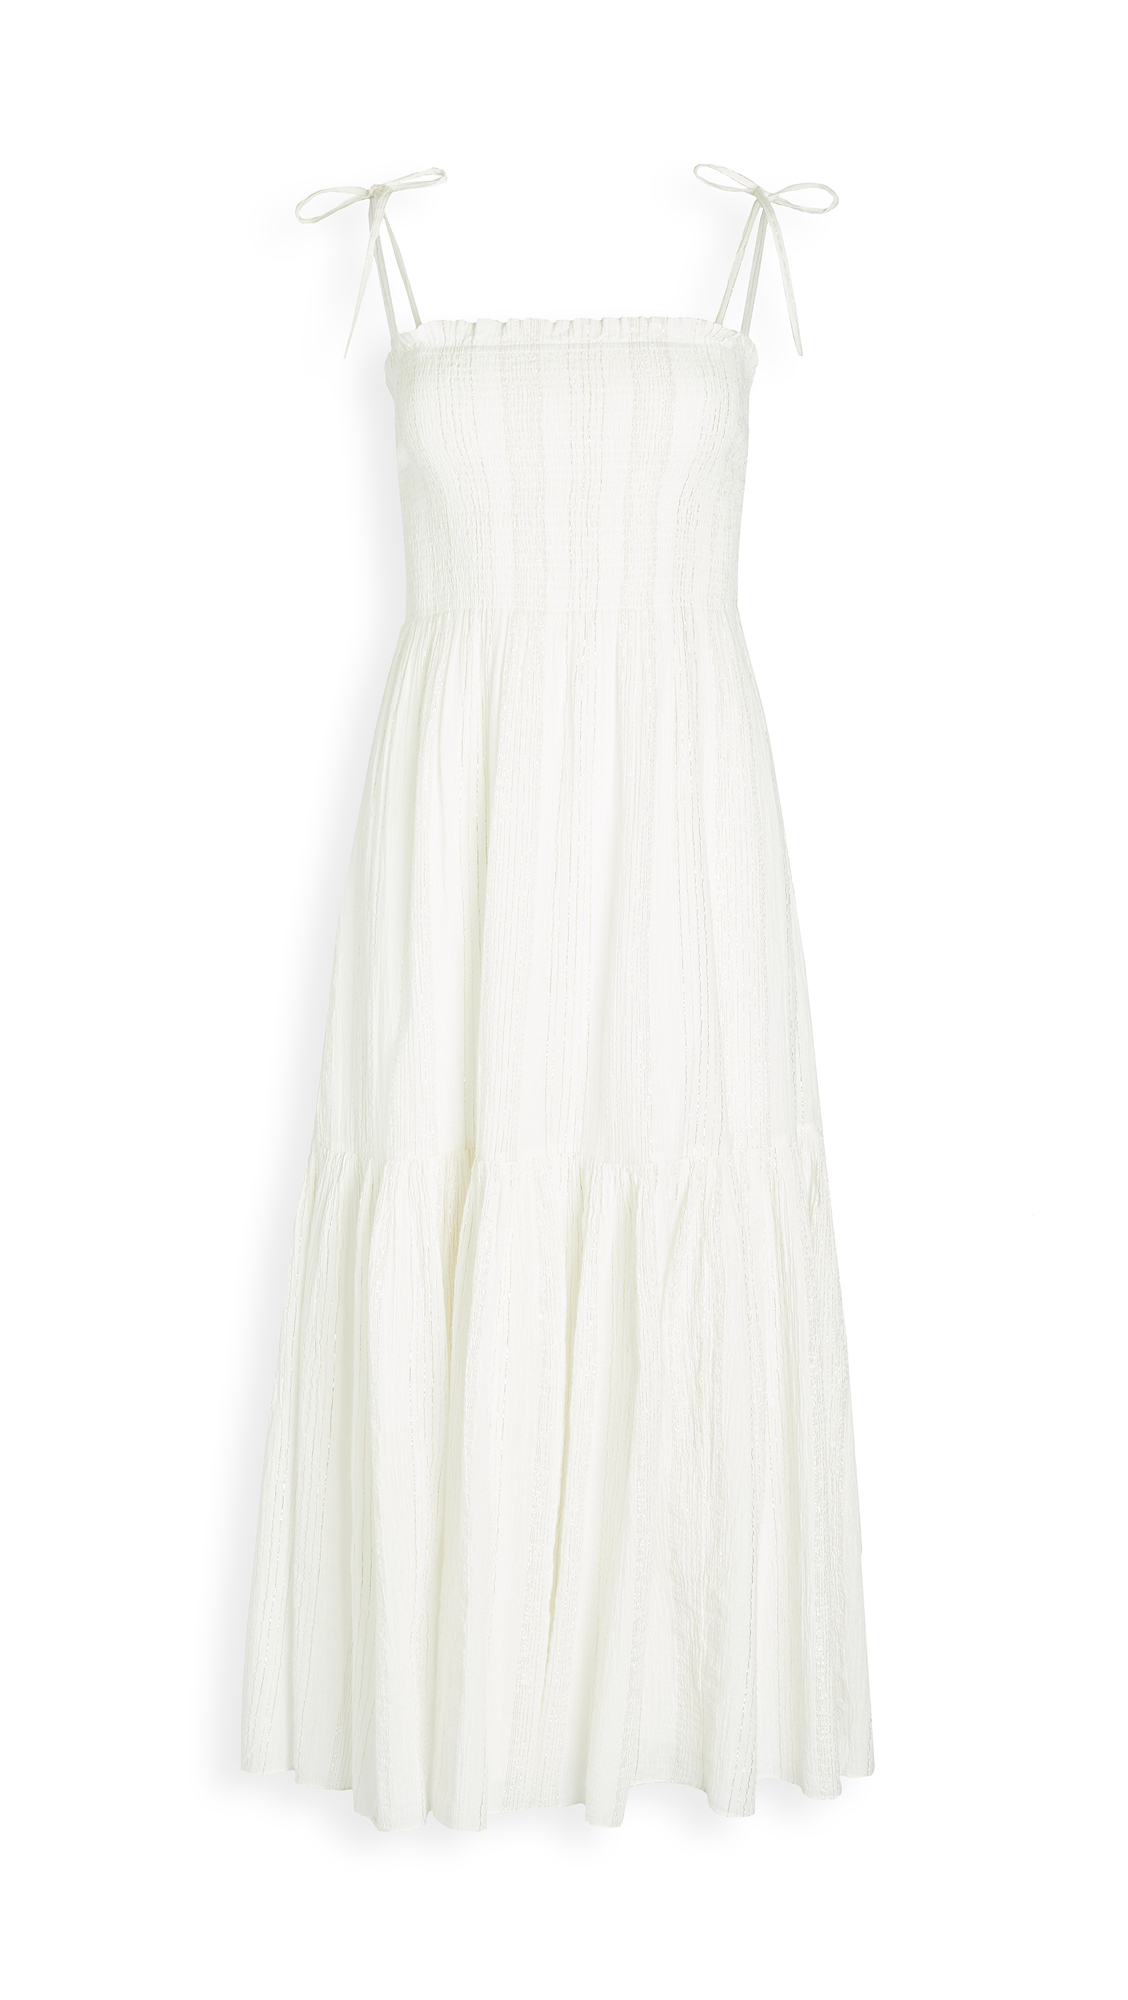 Photo of Joie Jailene Dress - shop Joie Clothing, Dresses online